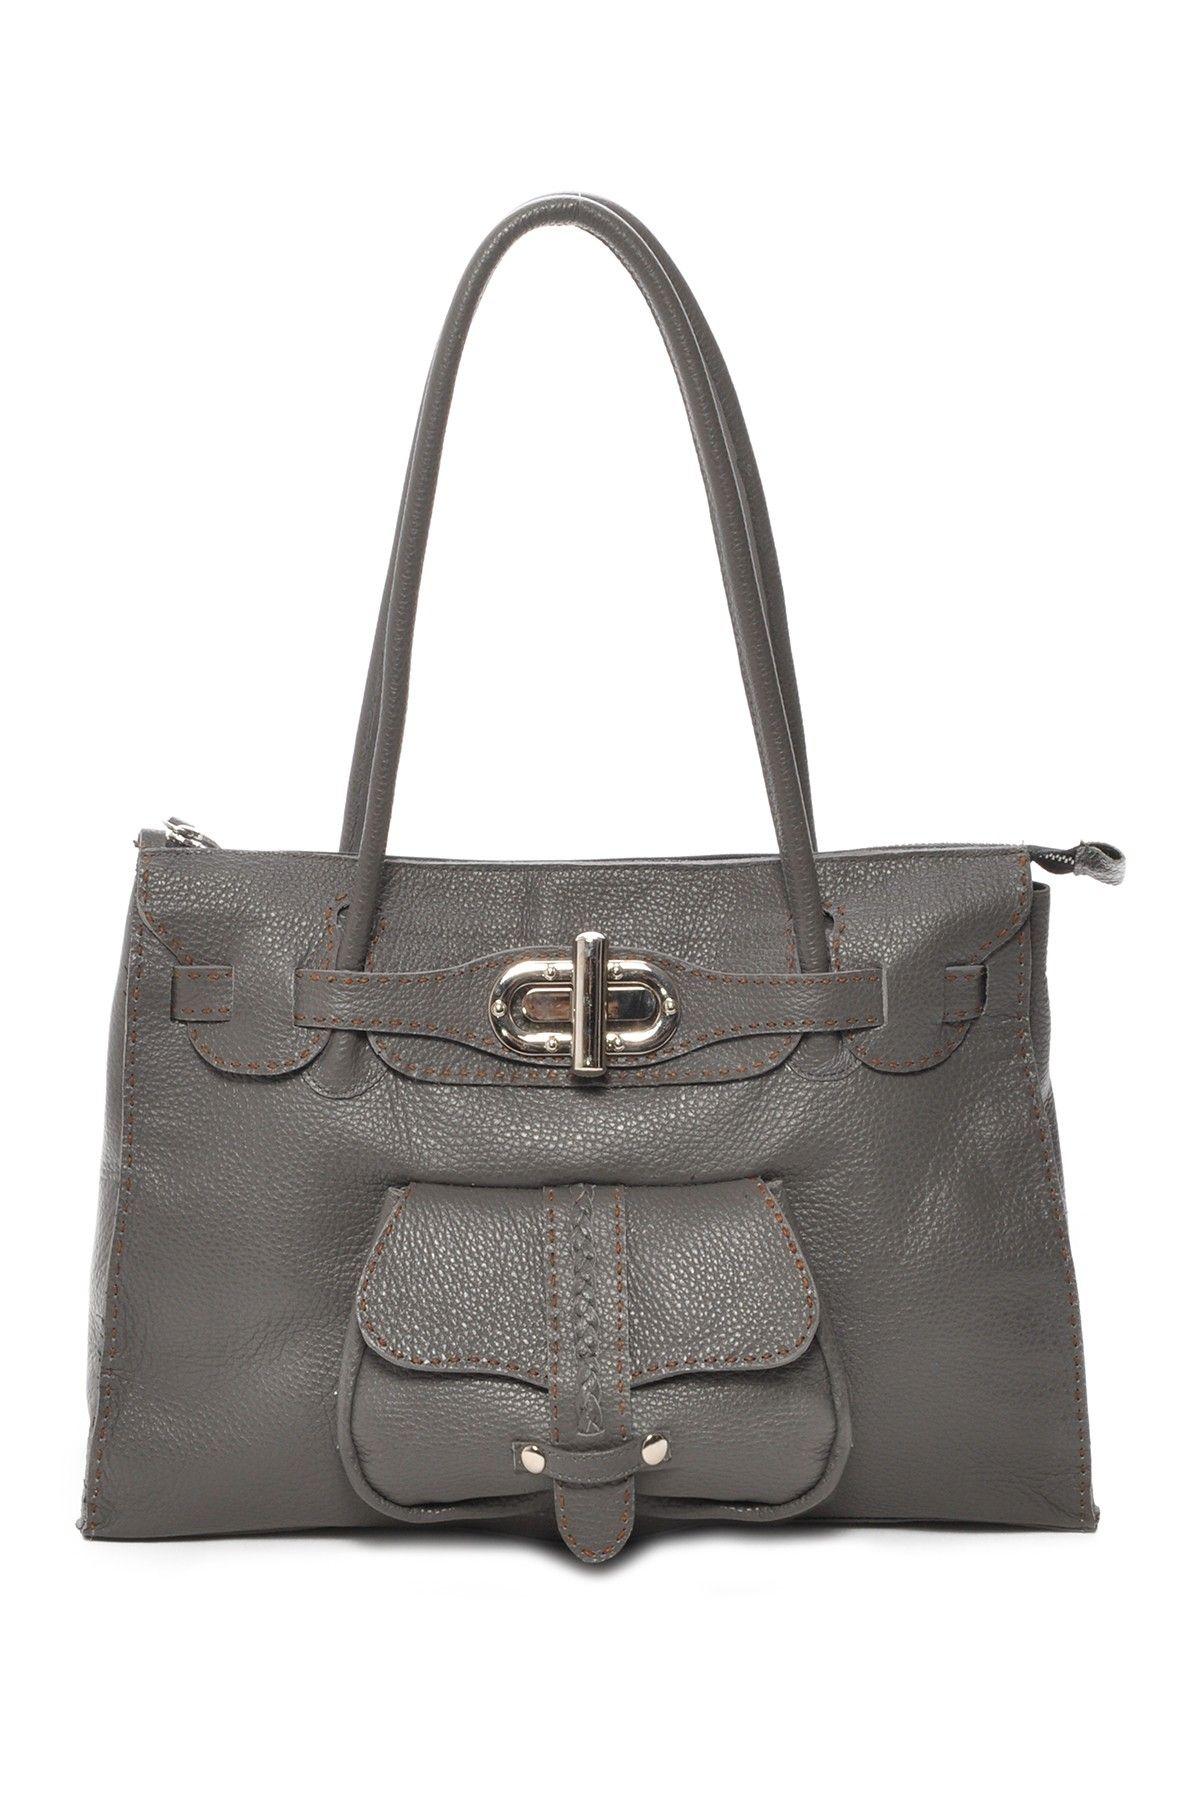 Carla Mancini Top Zip Leather Tote Leather Tote Bag Bags